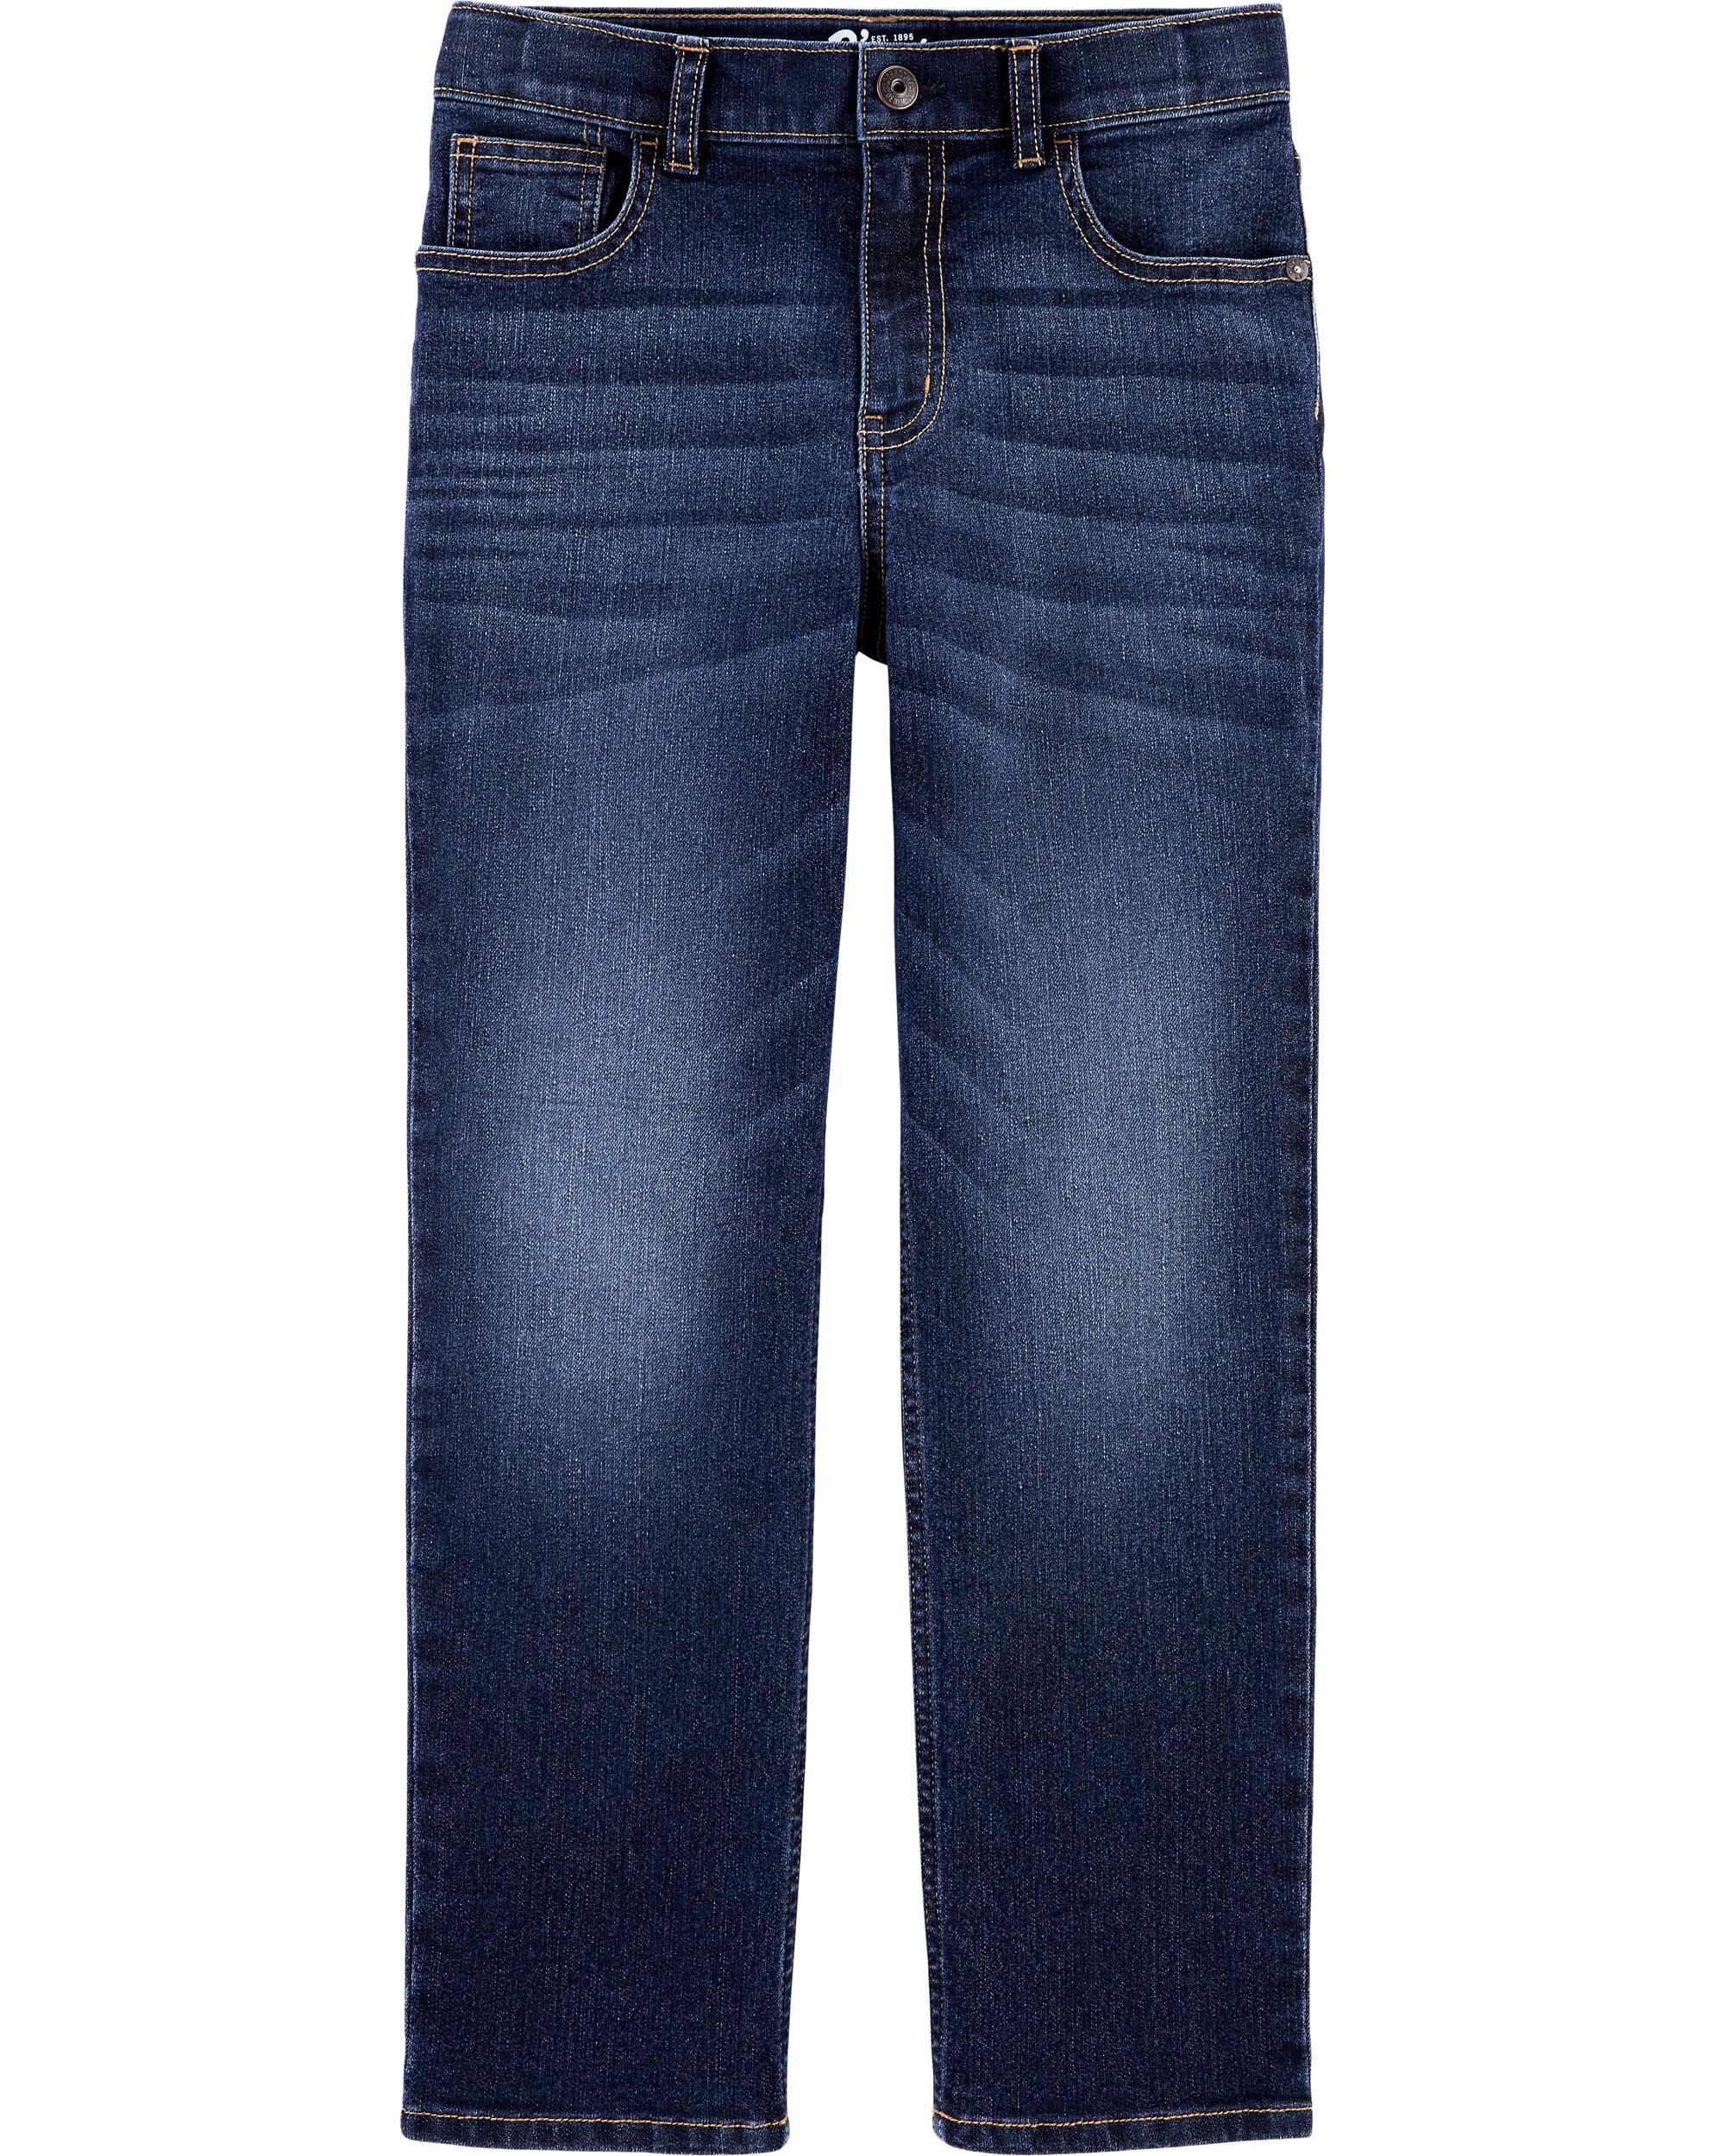 *DOORBUSTER*Slim Fit Classic Jeans - Rail Tie Medium Faded Wash